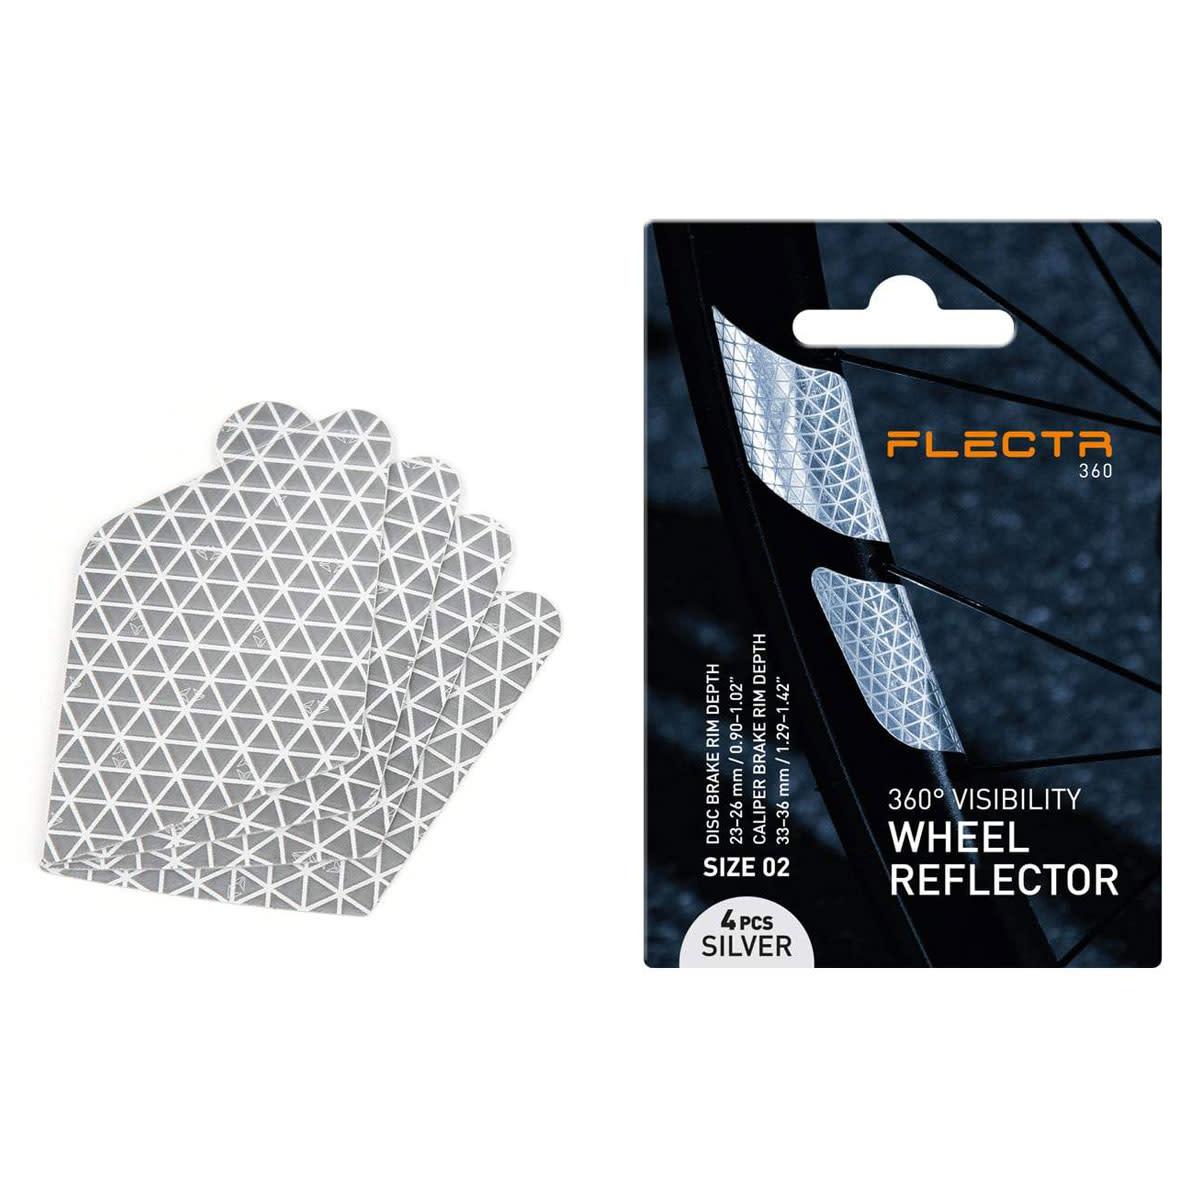 ENSEMBLE DE REFLECTEURS 360 FLECTR - 1